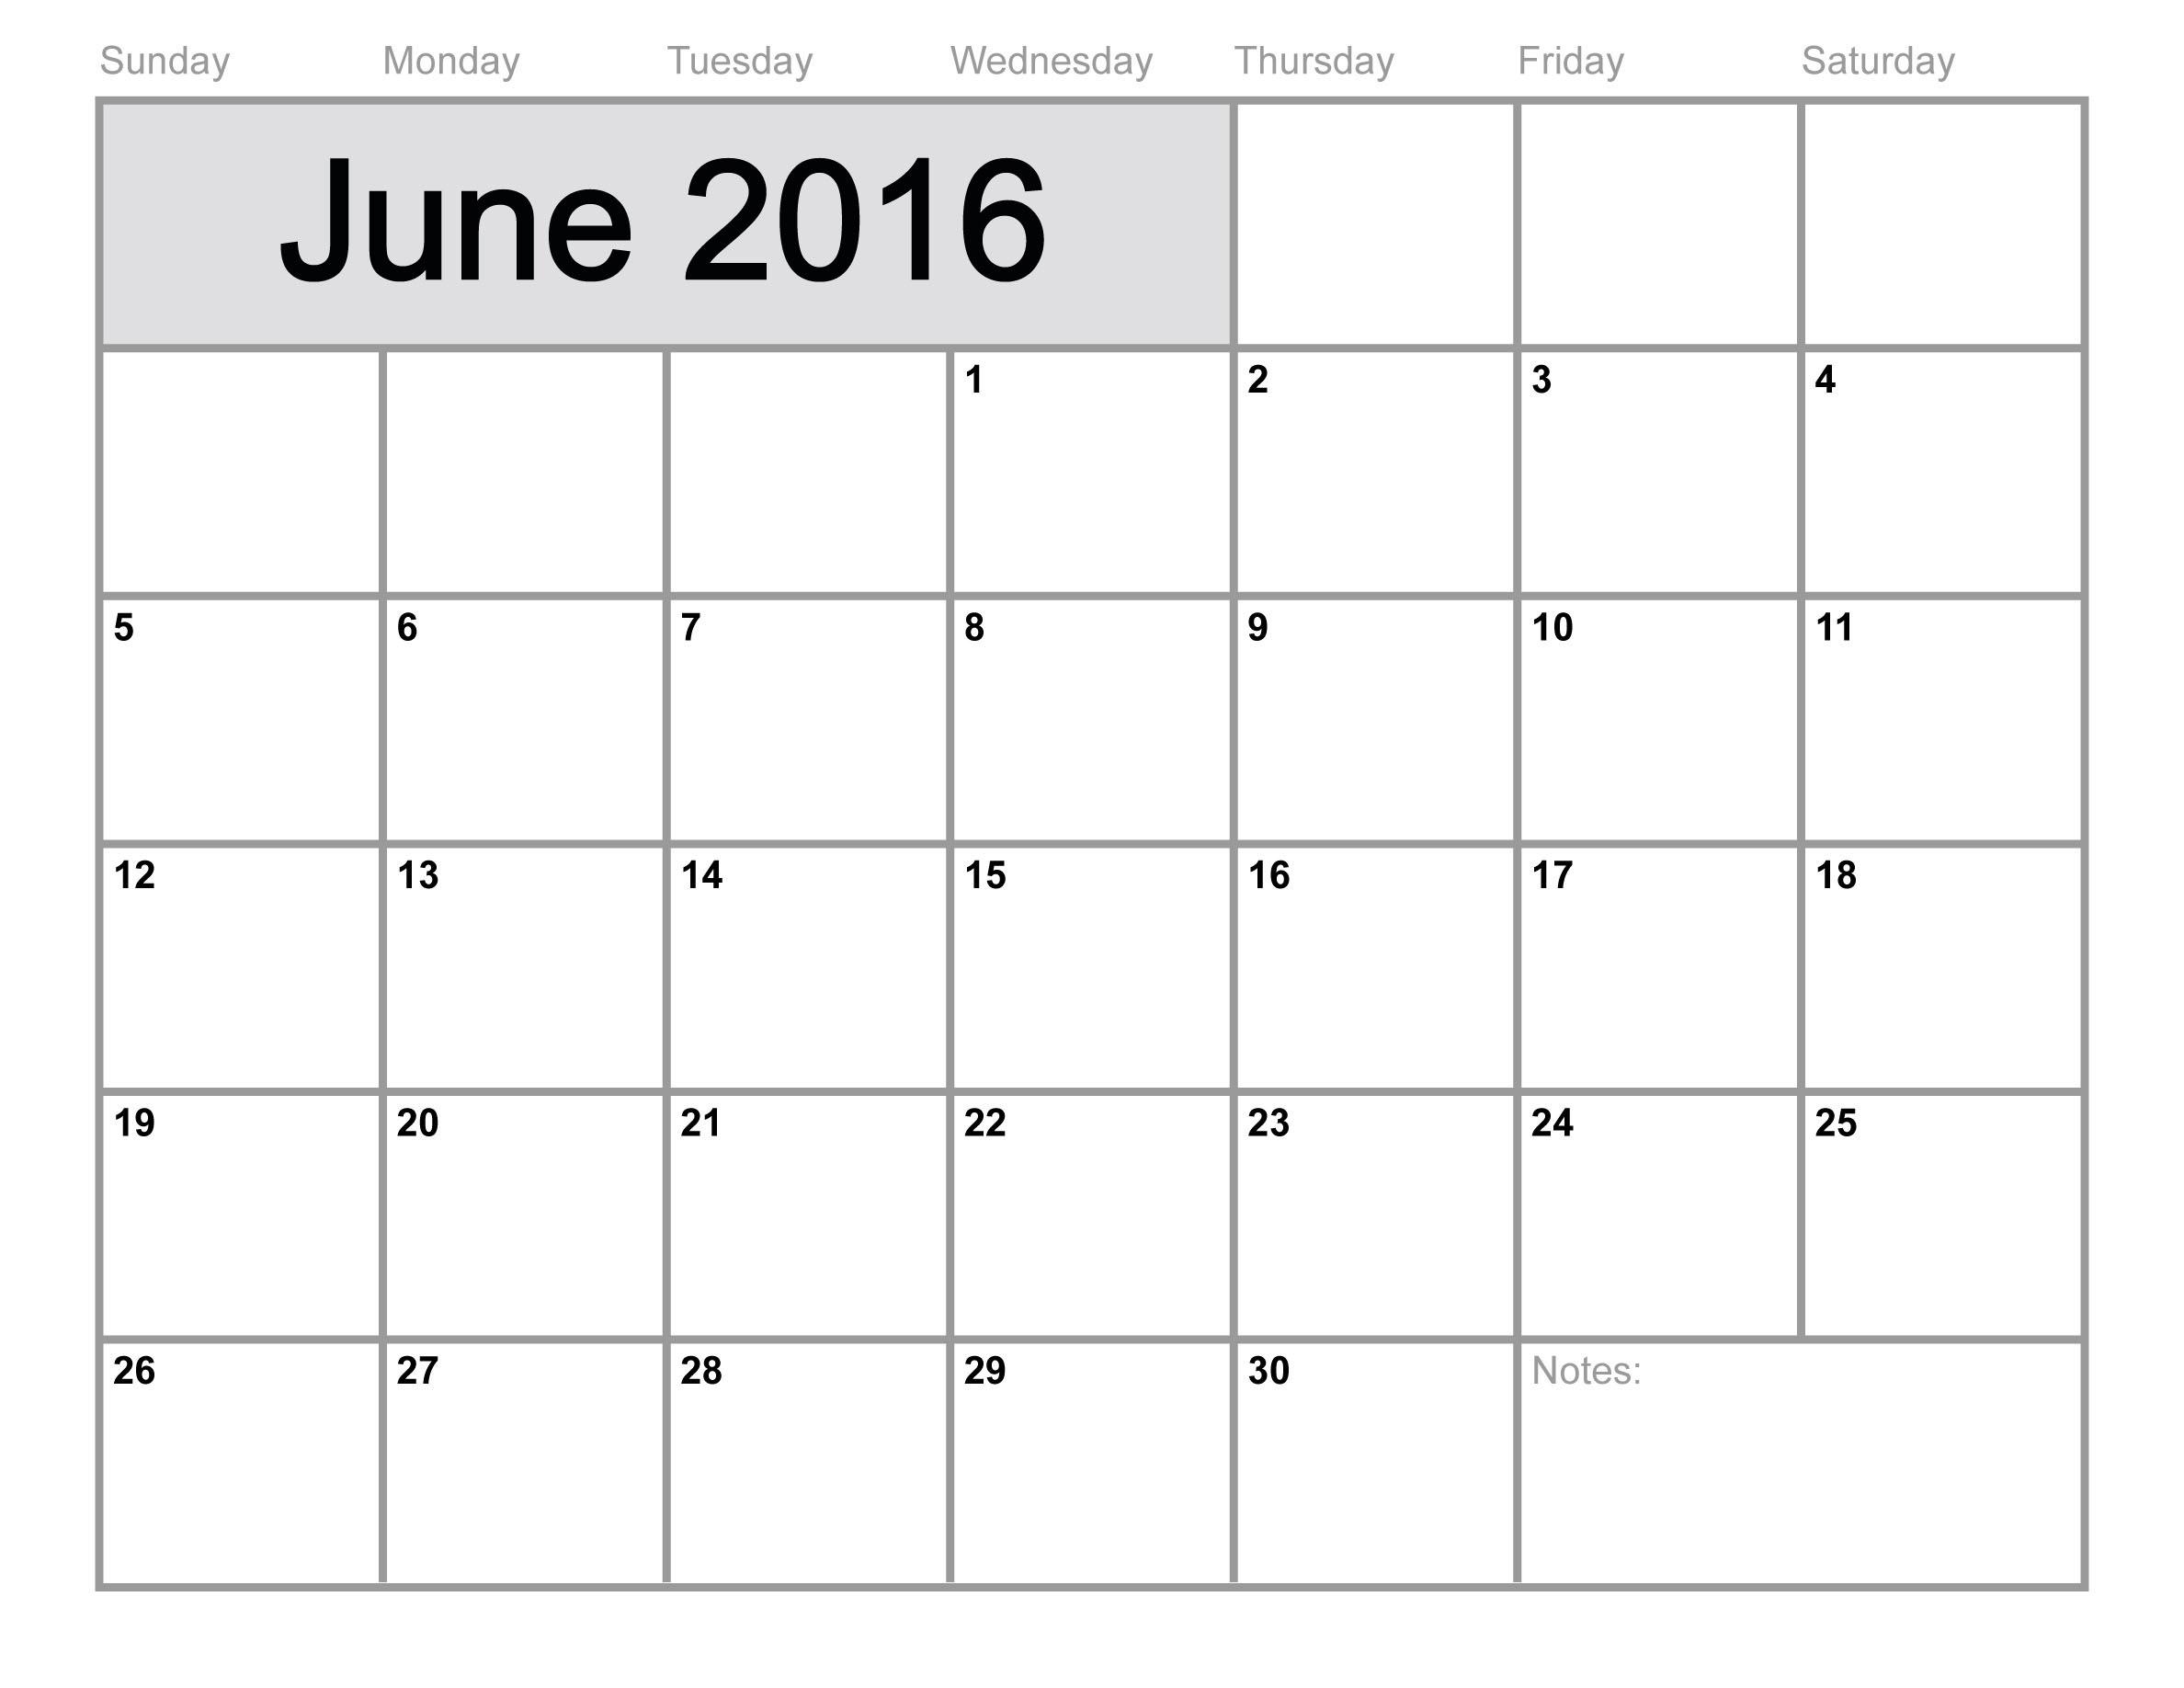 june-2016-calendar-win-2016-june-calendar-win-oxrDga.jpg